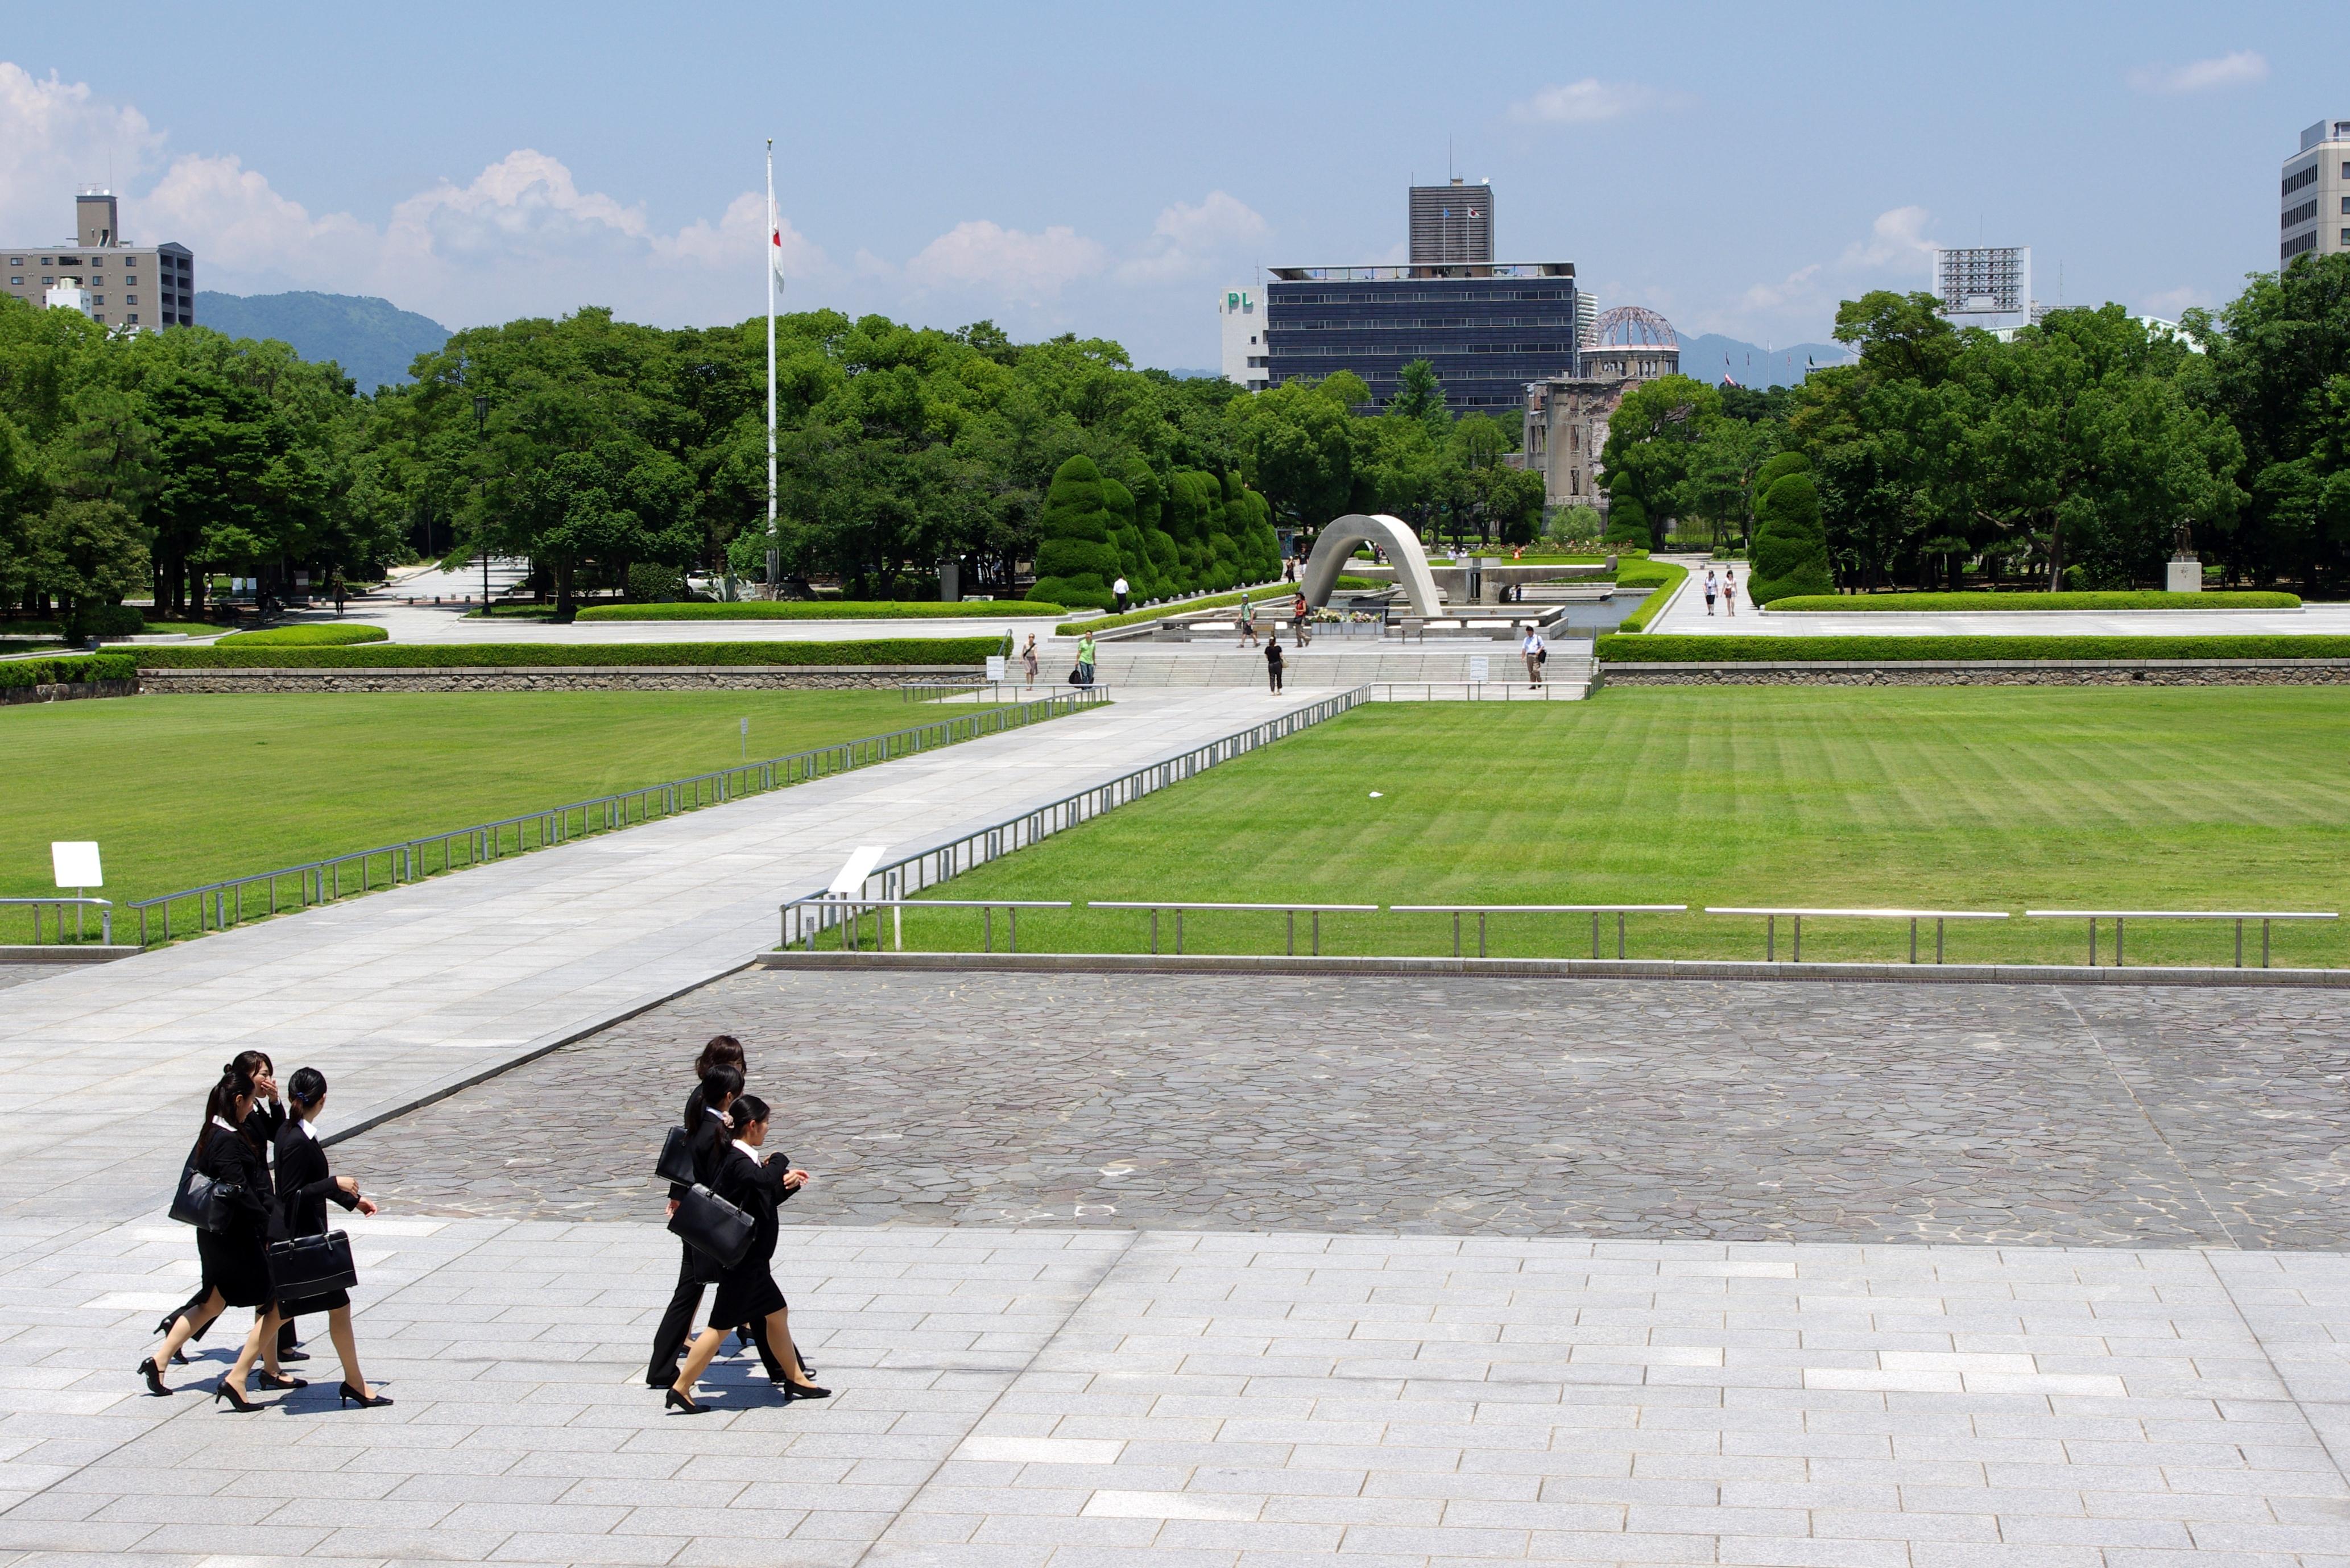 About: 広島平和記念公園